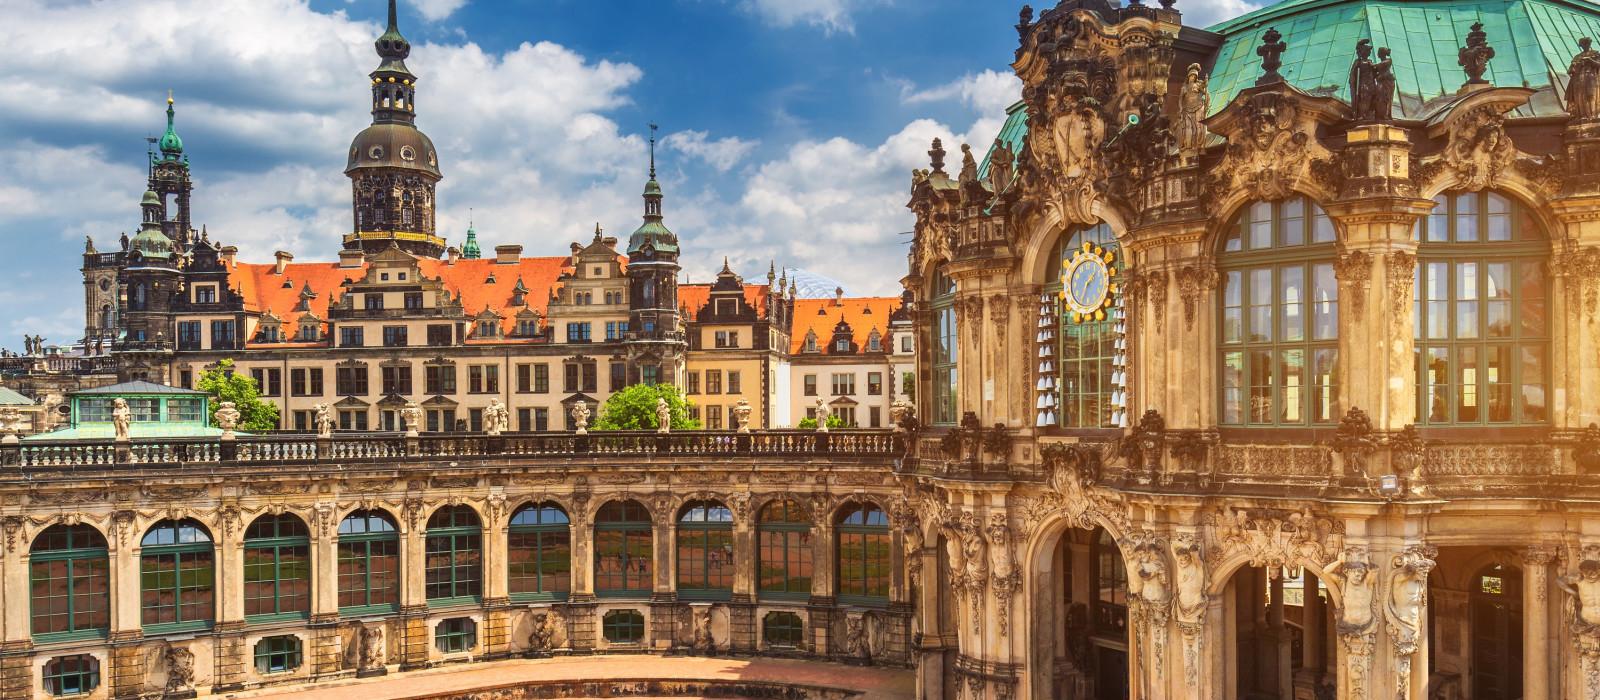 Destination Dresden Germany